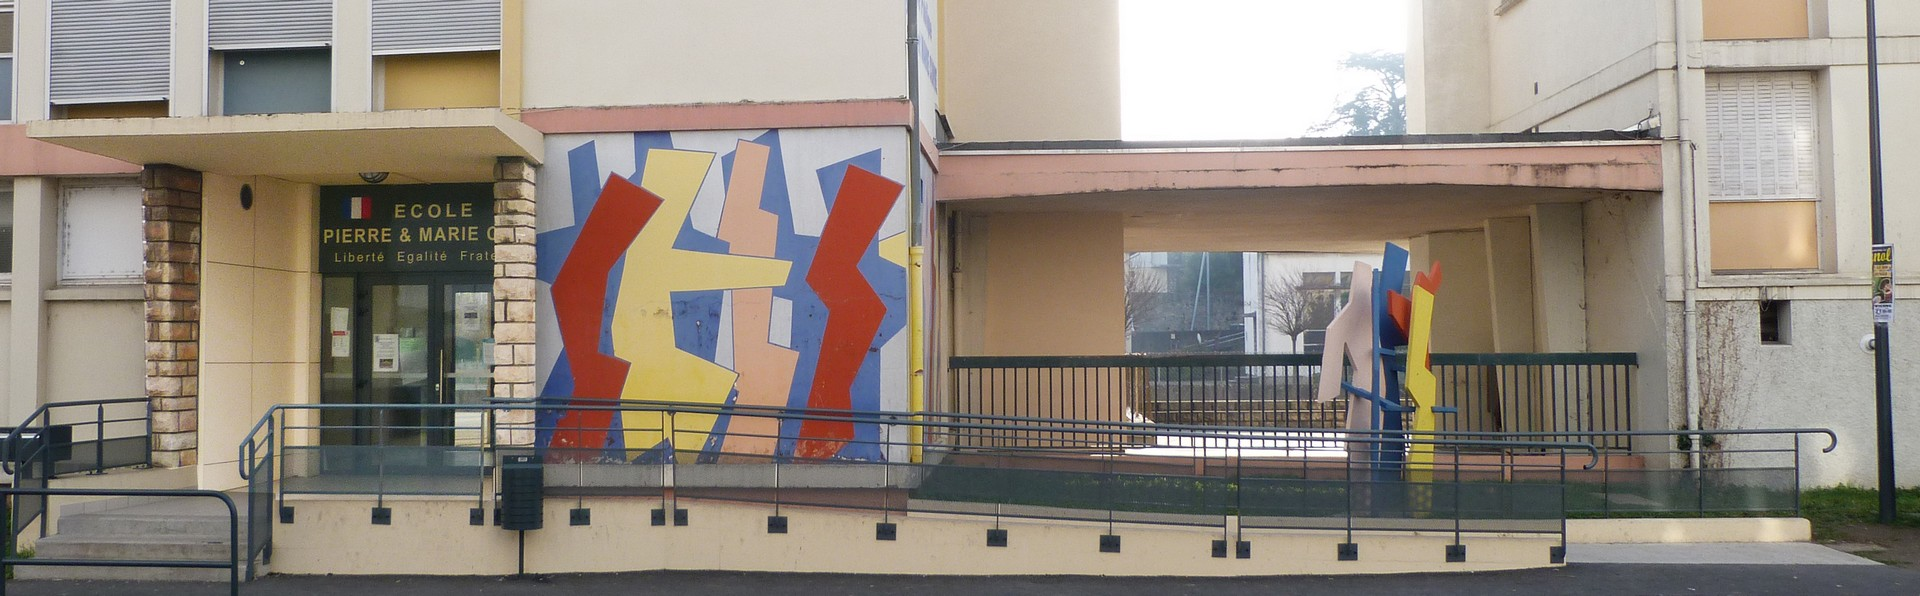 BORTOLI_ARCHITECTURE-P M CURIE 02